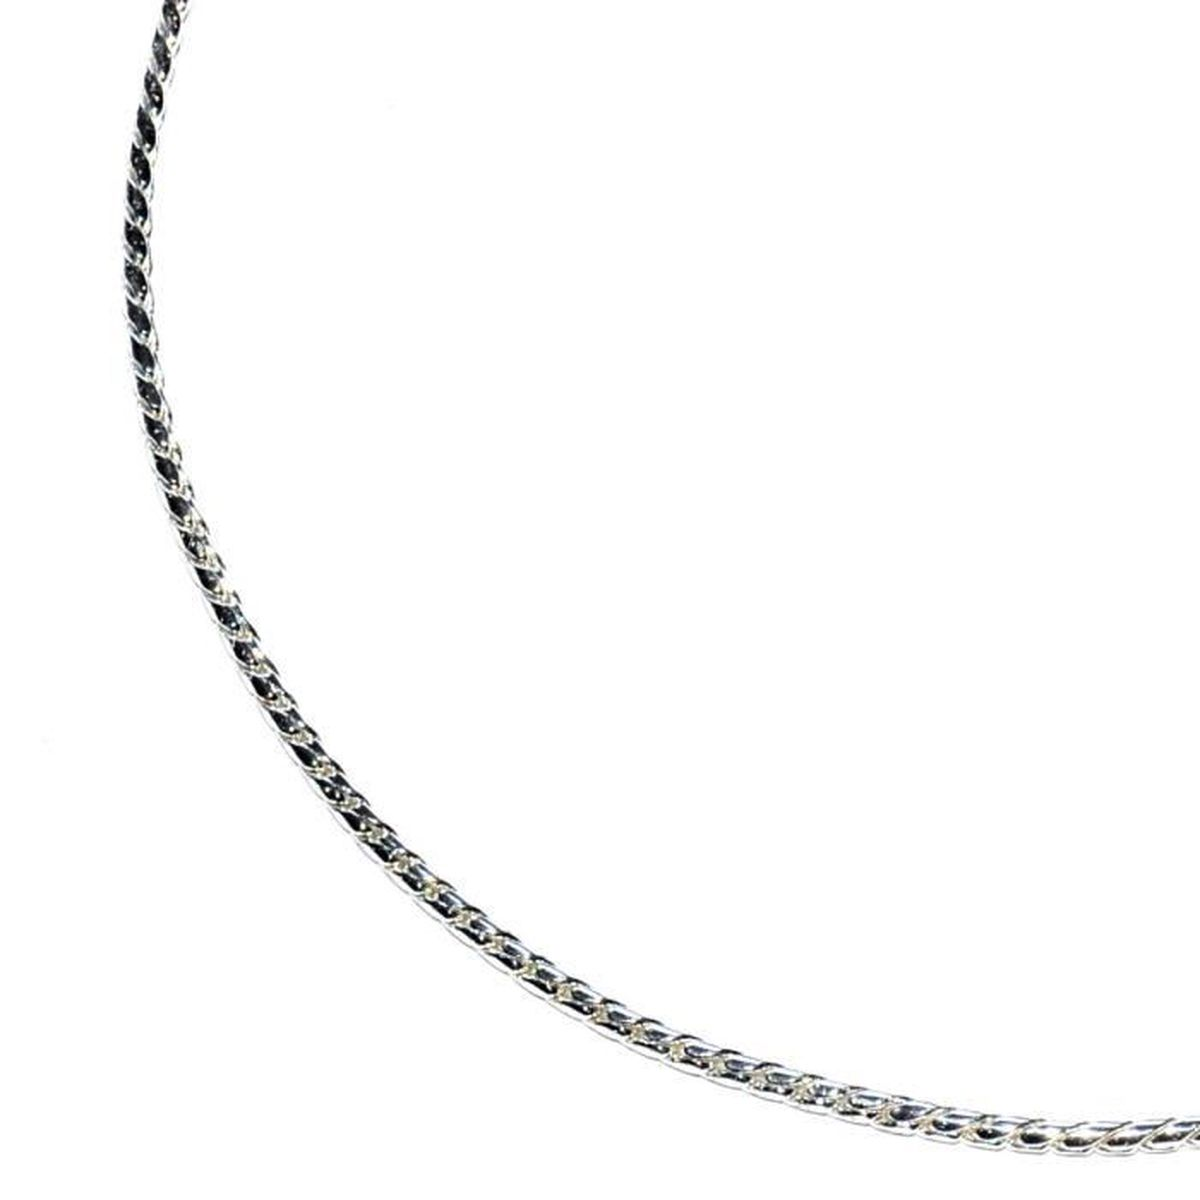 Collier argent maille corde - Achat   Vente pas cher 13caa4371ce4